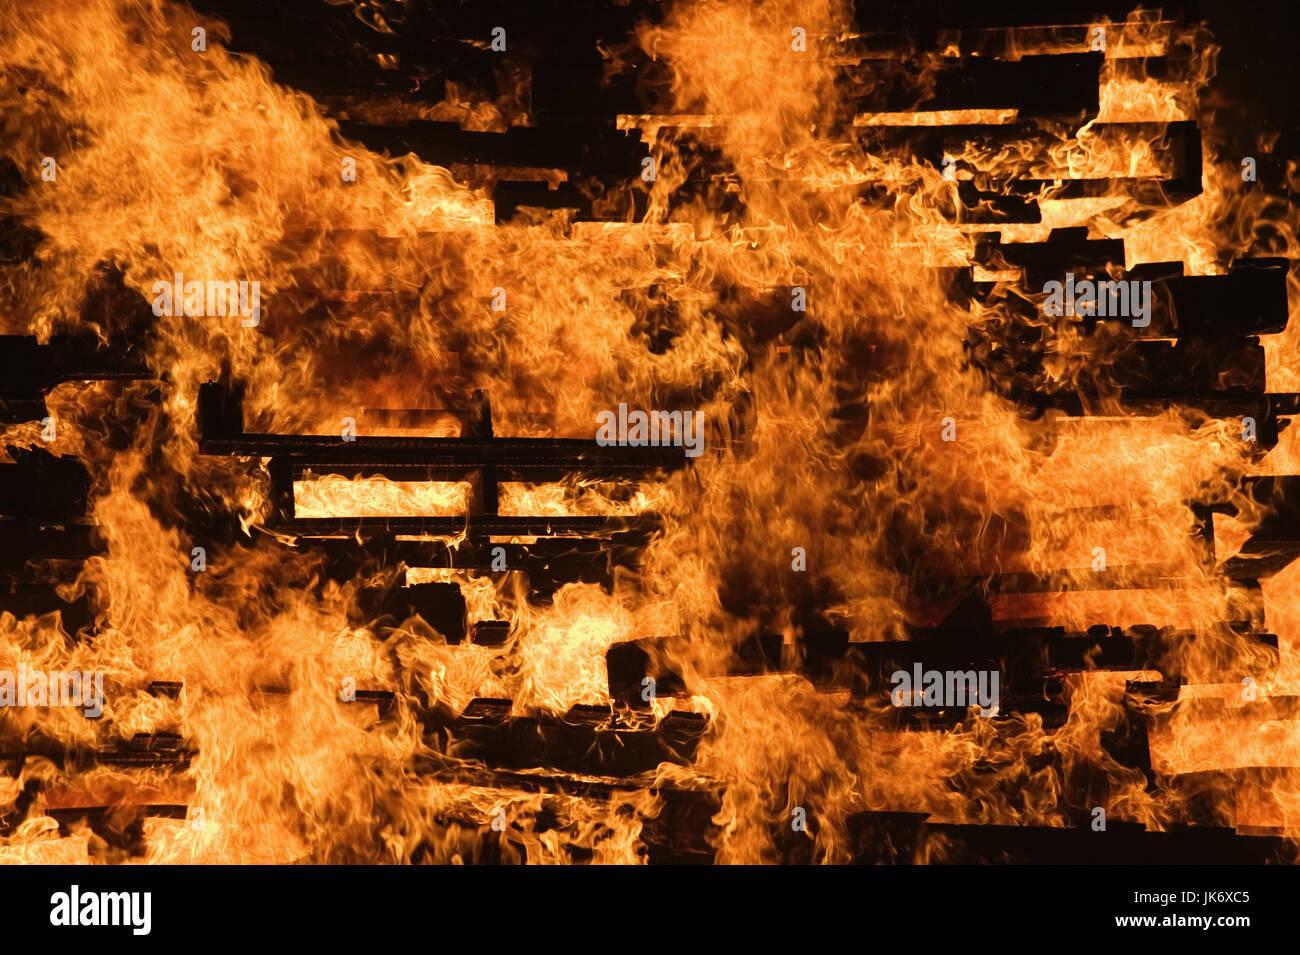 Feuer, Flammen   Mau_Set, Holzpaletten, Paletten, Holz, brennen, lodern, Freudenfeuer, Brand, Hitze, Zerstörung, - Stock Image